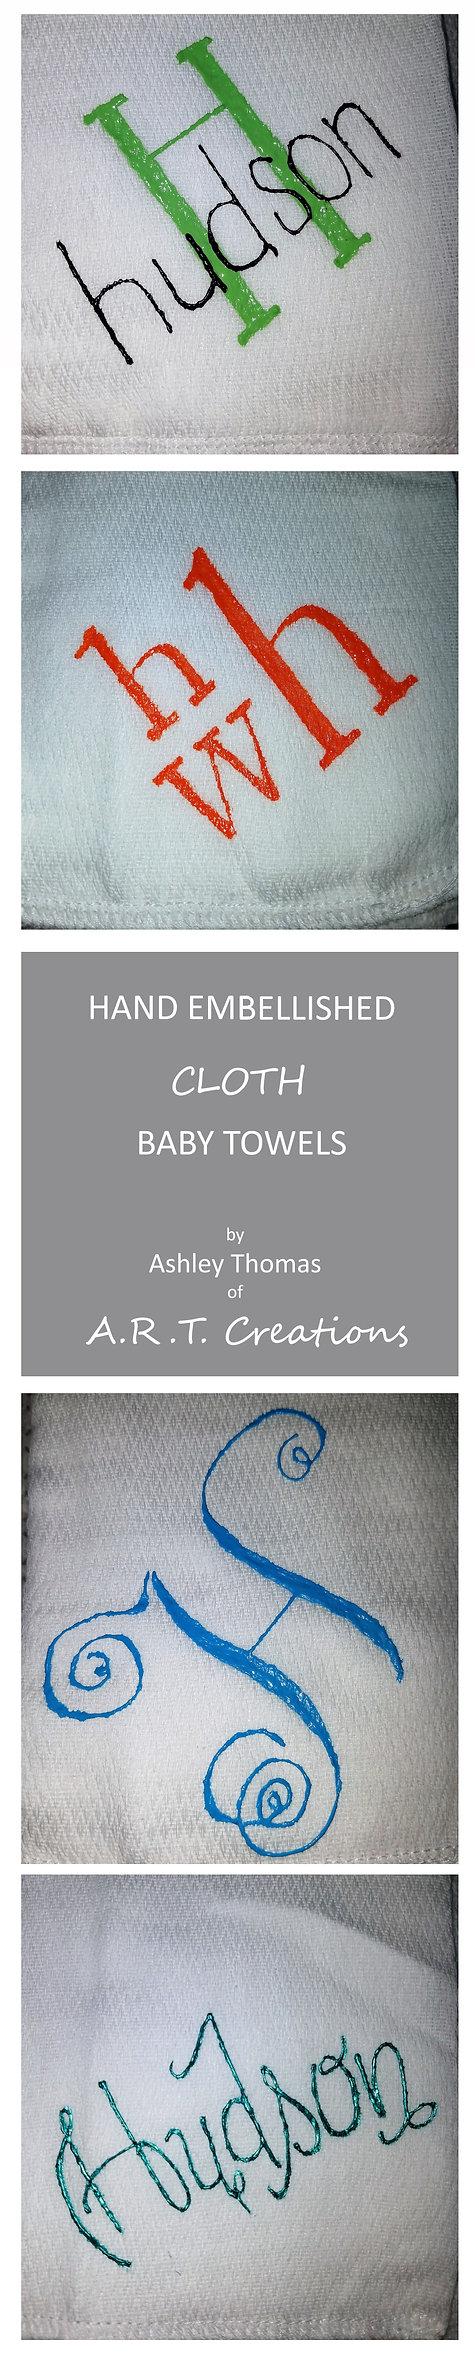 Hudson Huovinen's Towels Pin.jpg